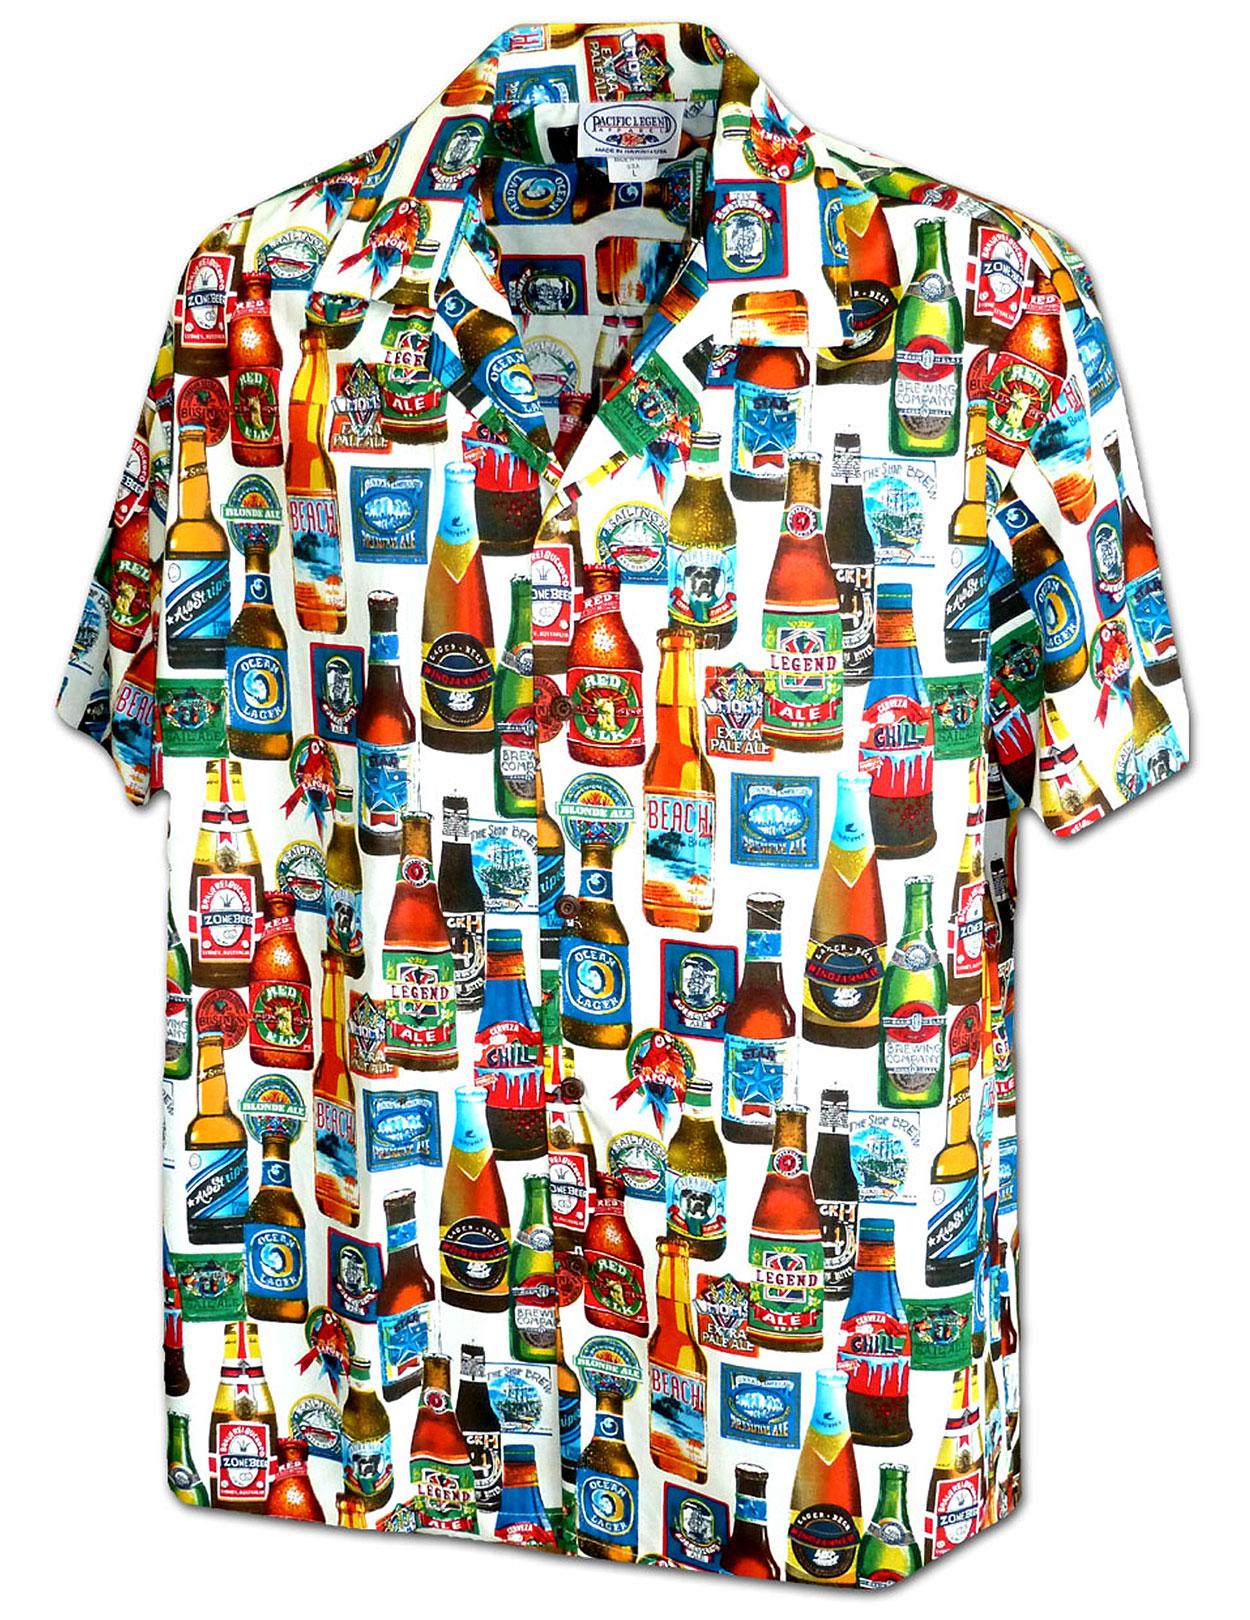 Parrot Bartender Aloha Shirt: Shaka Time Hawaii Clothing Store